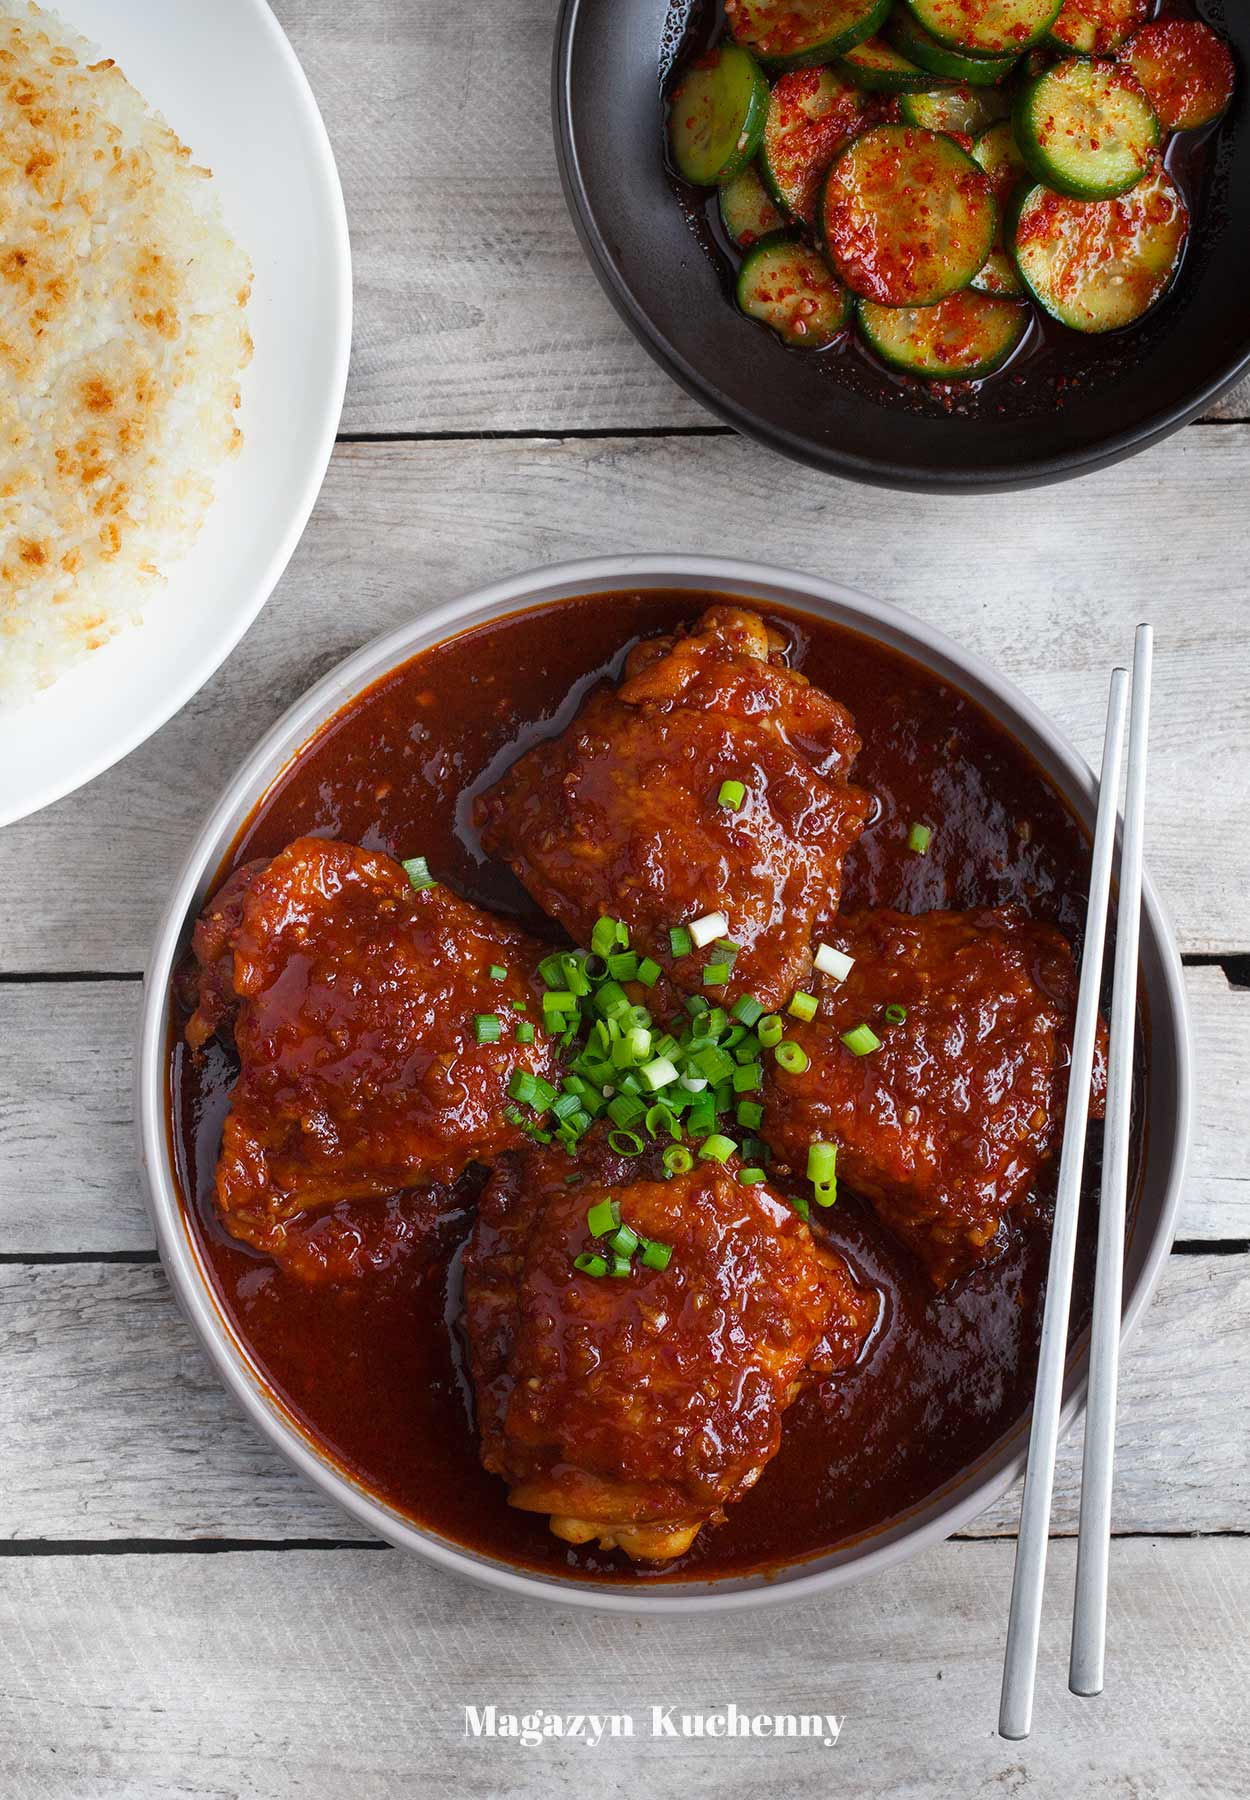 Kurczak po koreańsku duszony z pastą gochujang